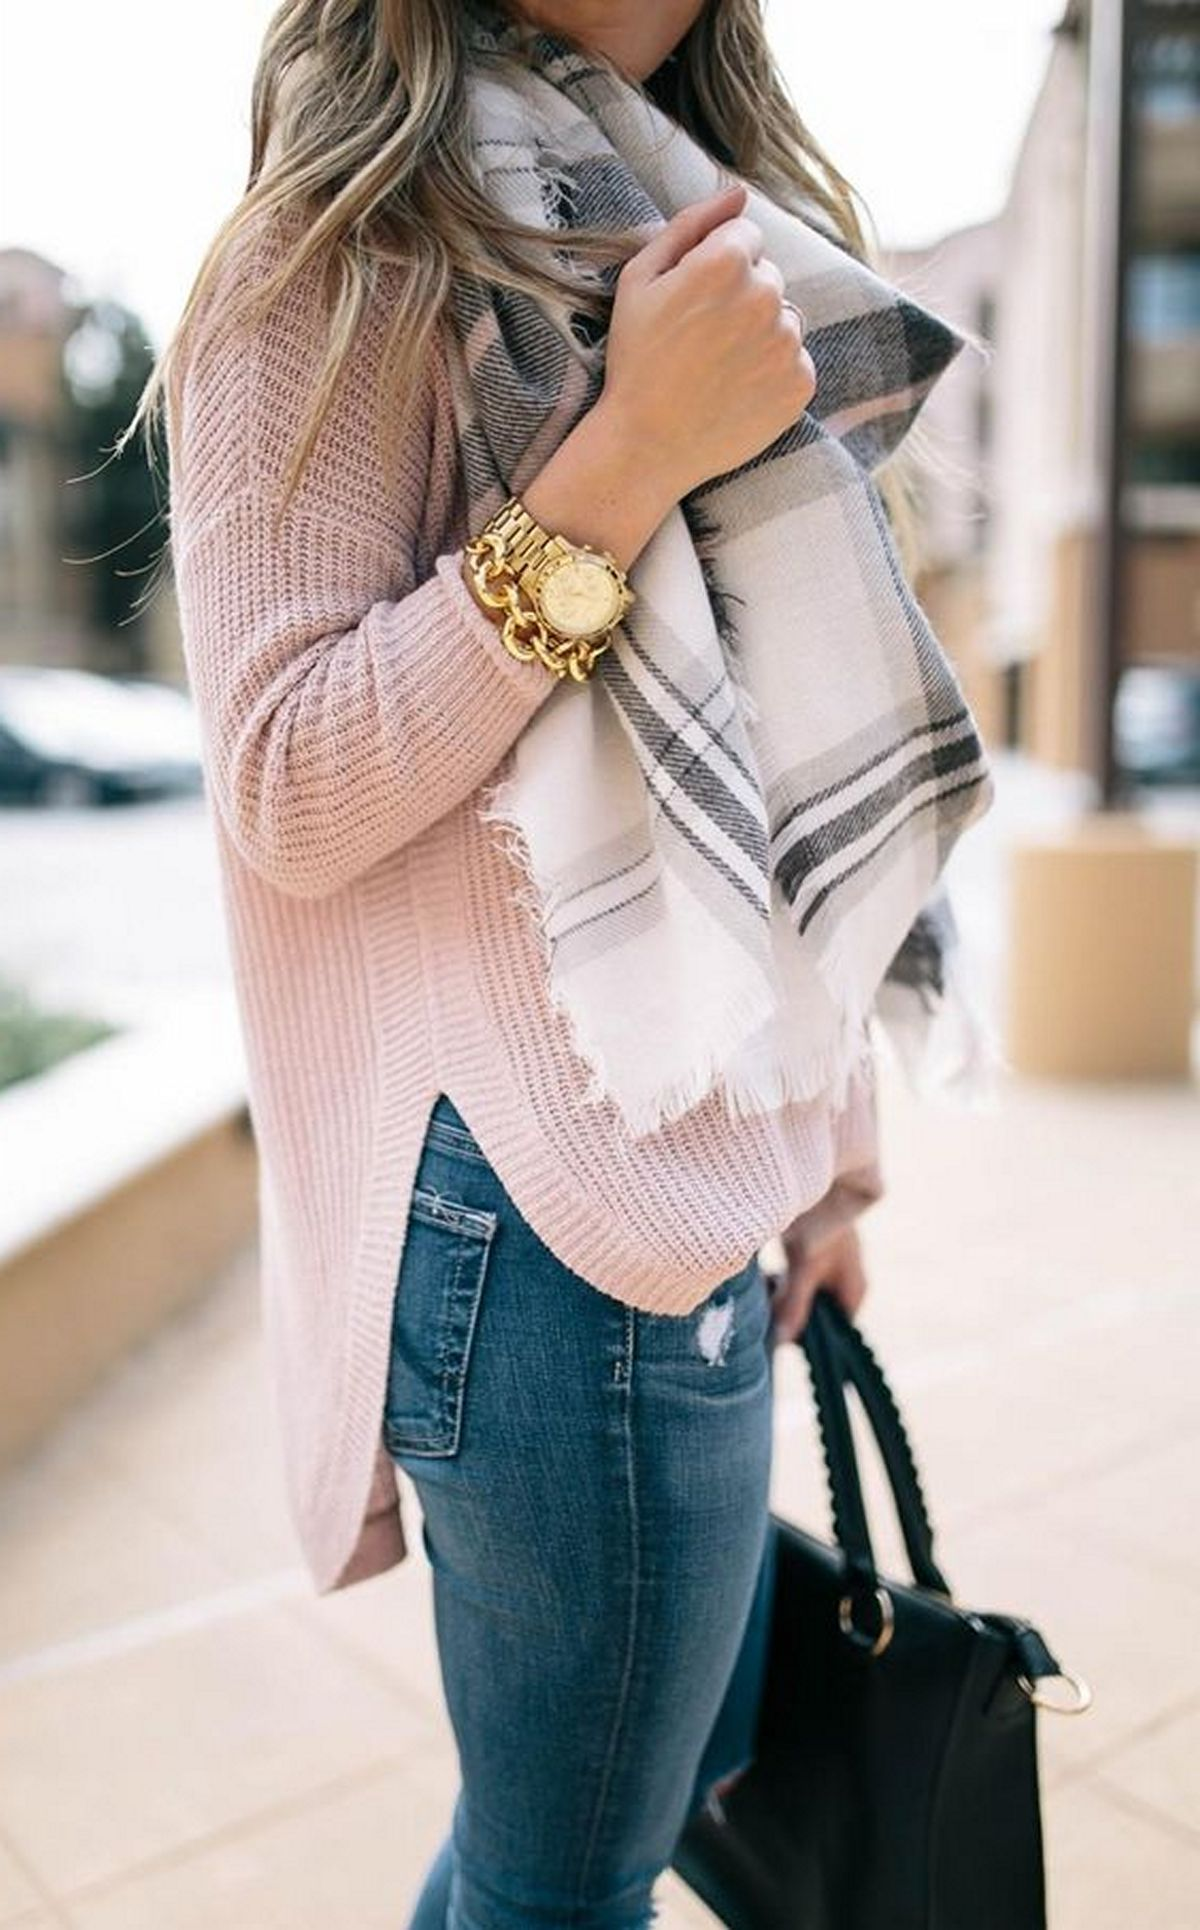 Fall outfits 2019 Winter fashion 2019